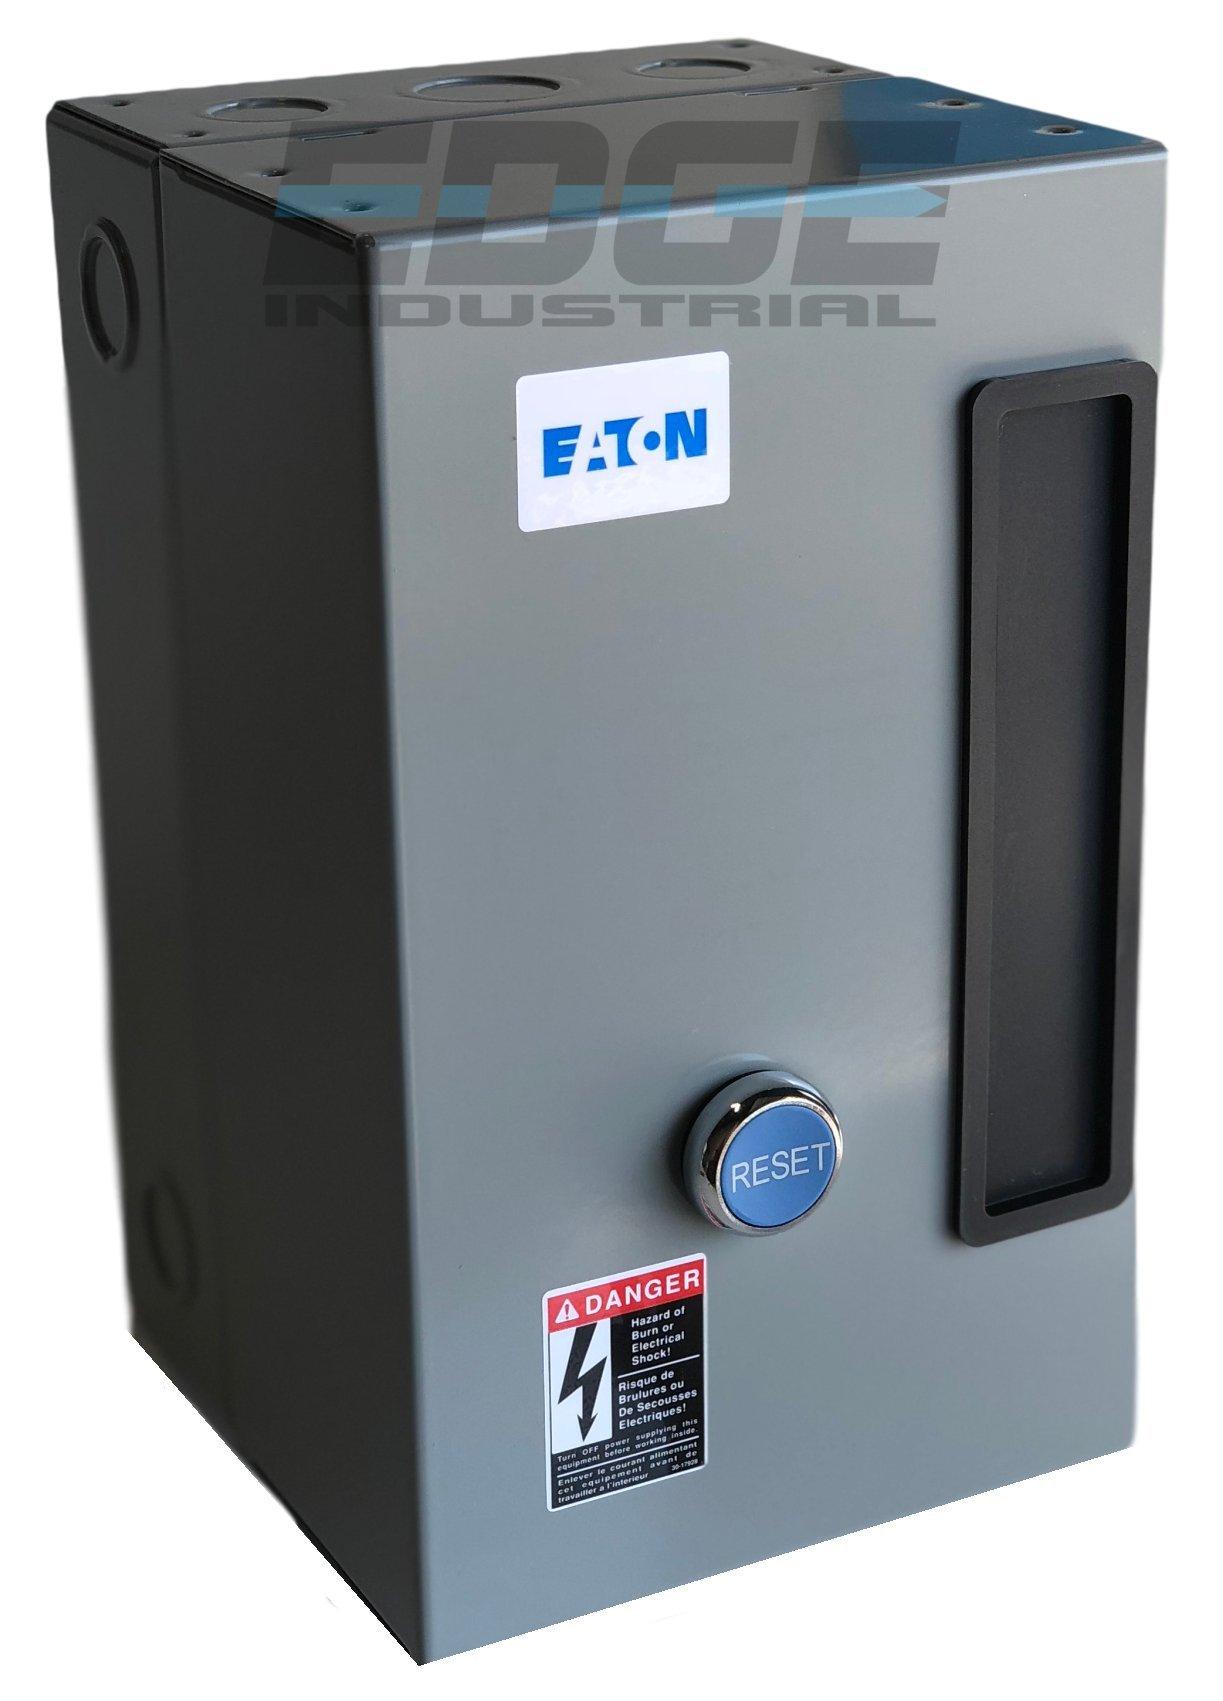 EATON A27CGF45B057 MAGNETIC MOTOR STARTER 15HP 3 PHASE 230 VOLT 45 AMP DEFINITE PURPOSE STARTER CONTROL